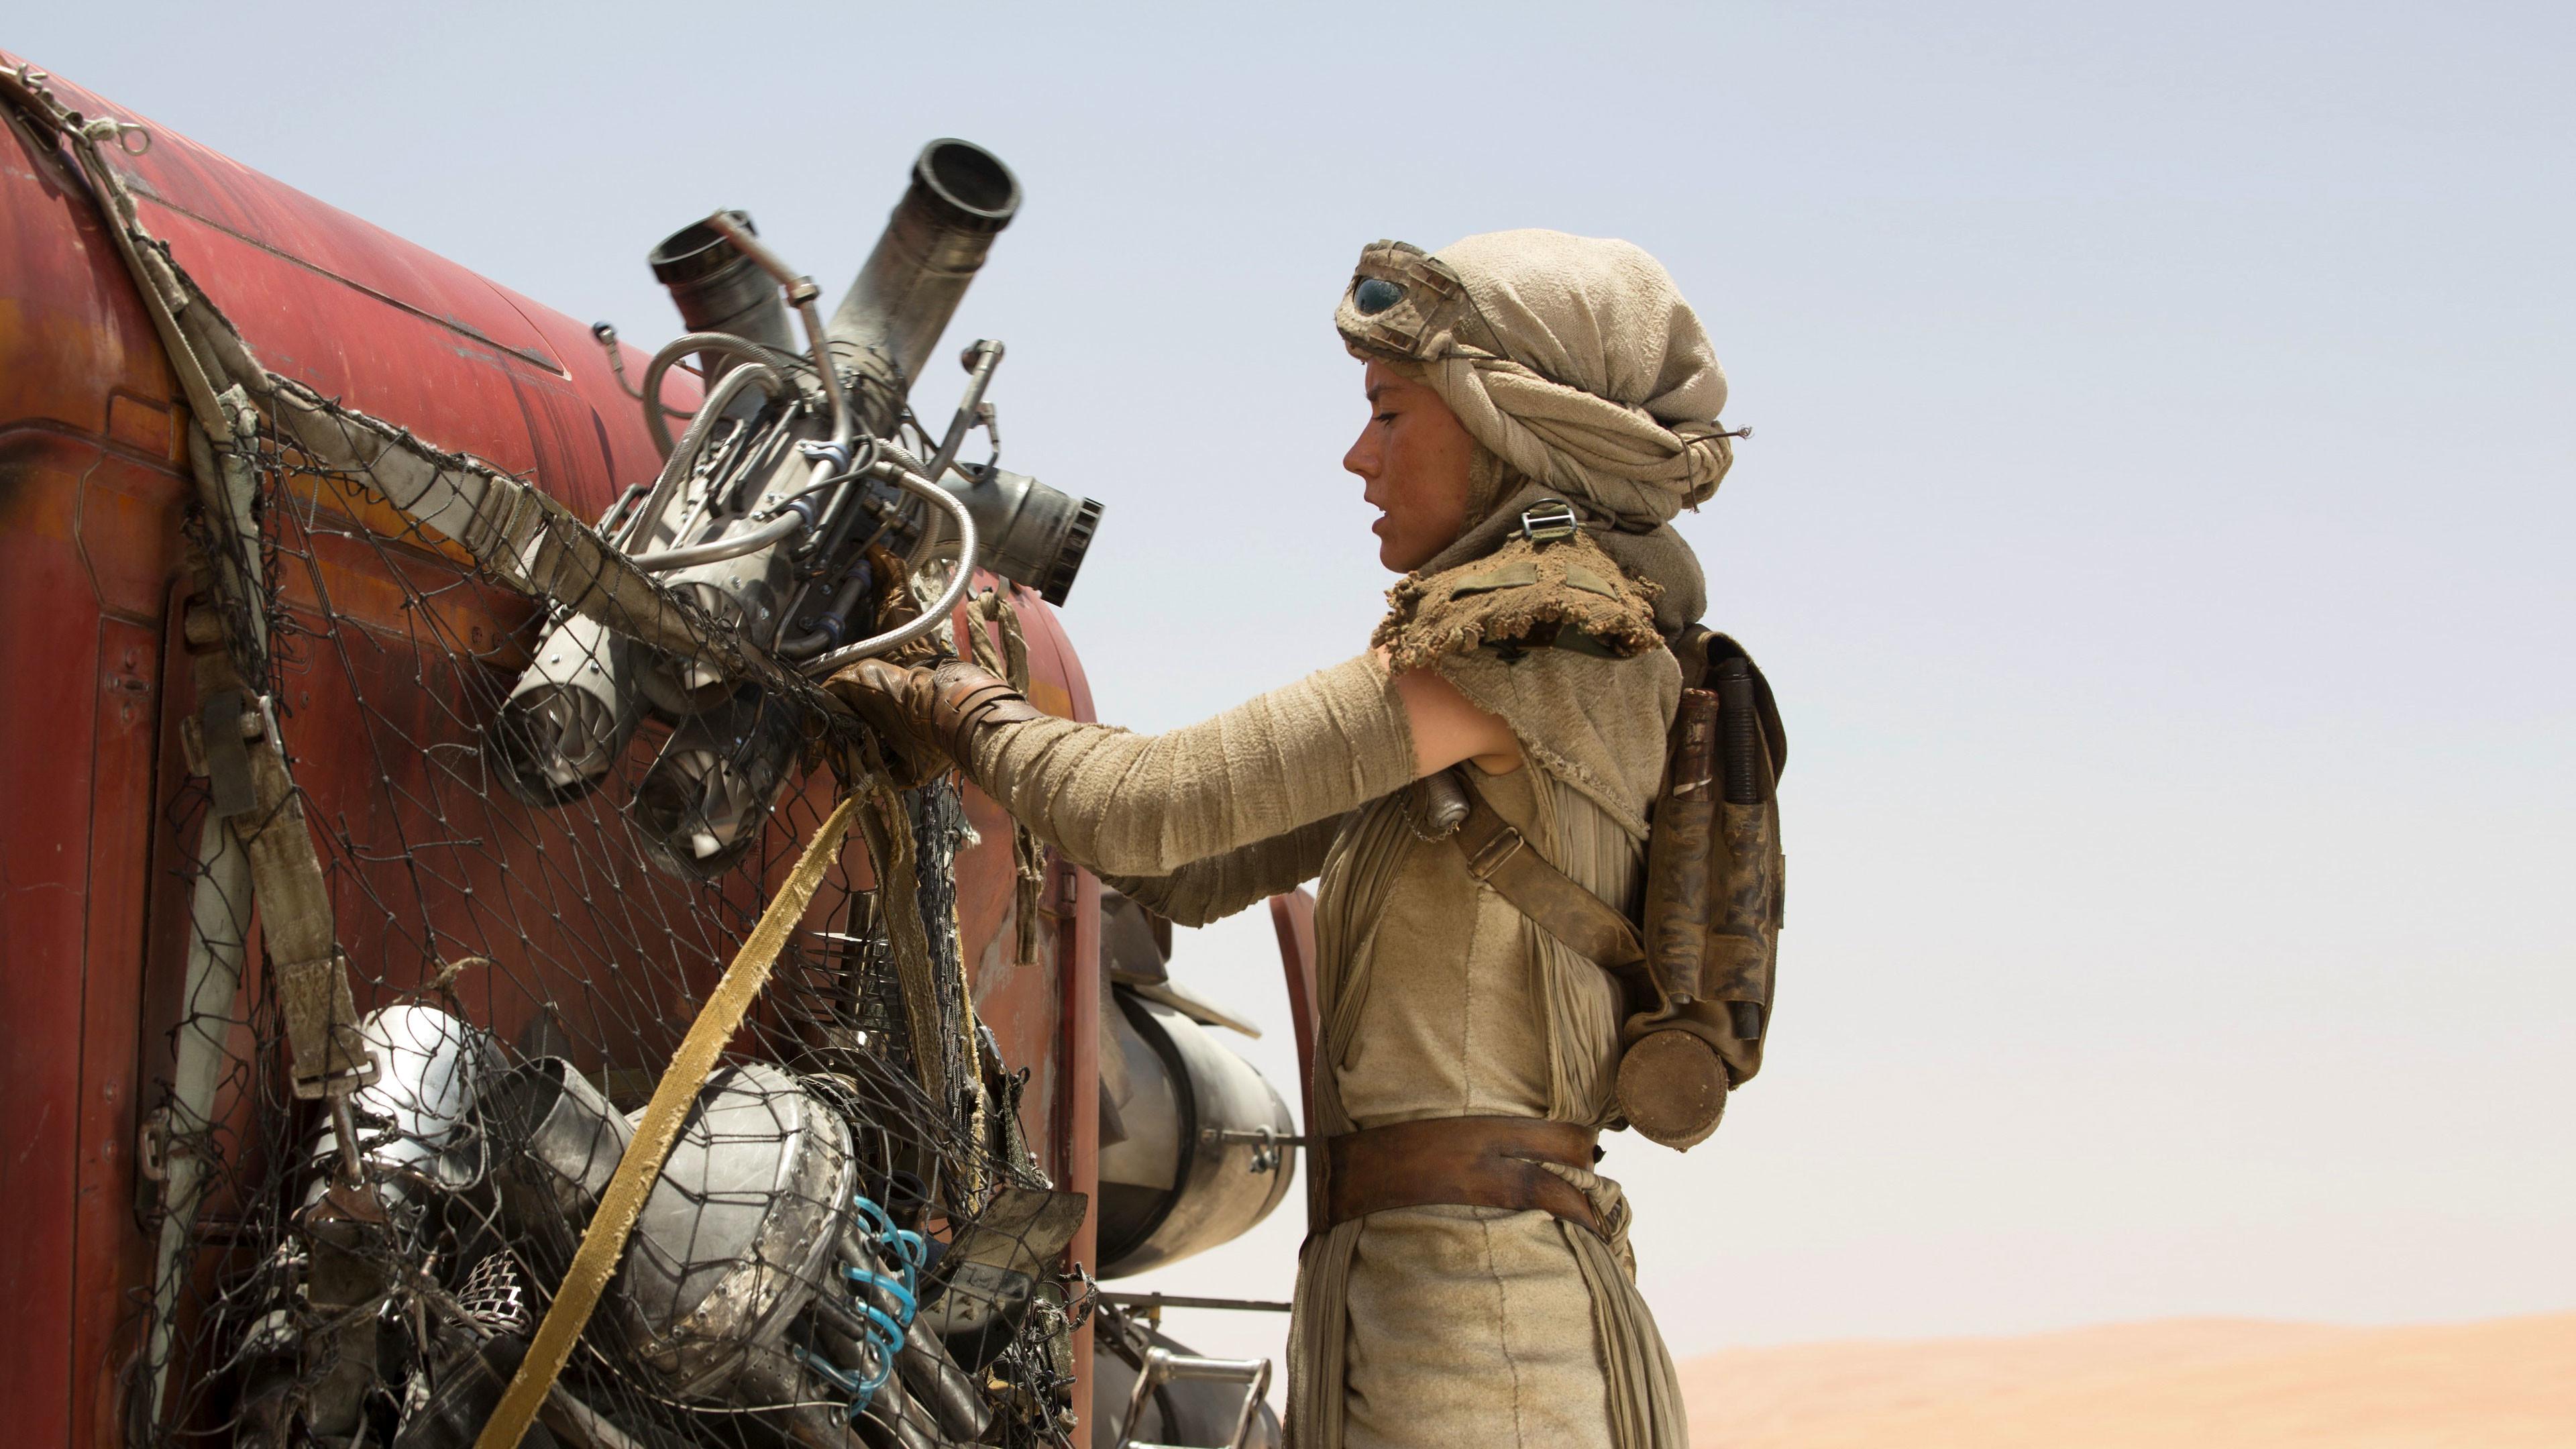 Rey with her Speeder – Star Wars 7: The Force Awakens wallpaper